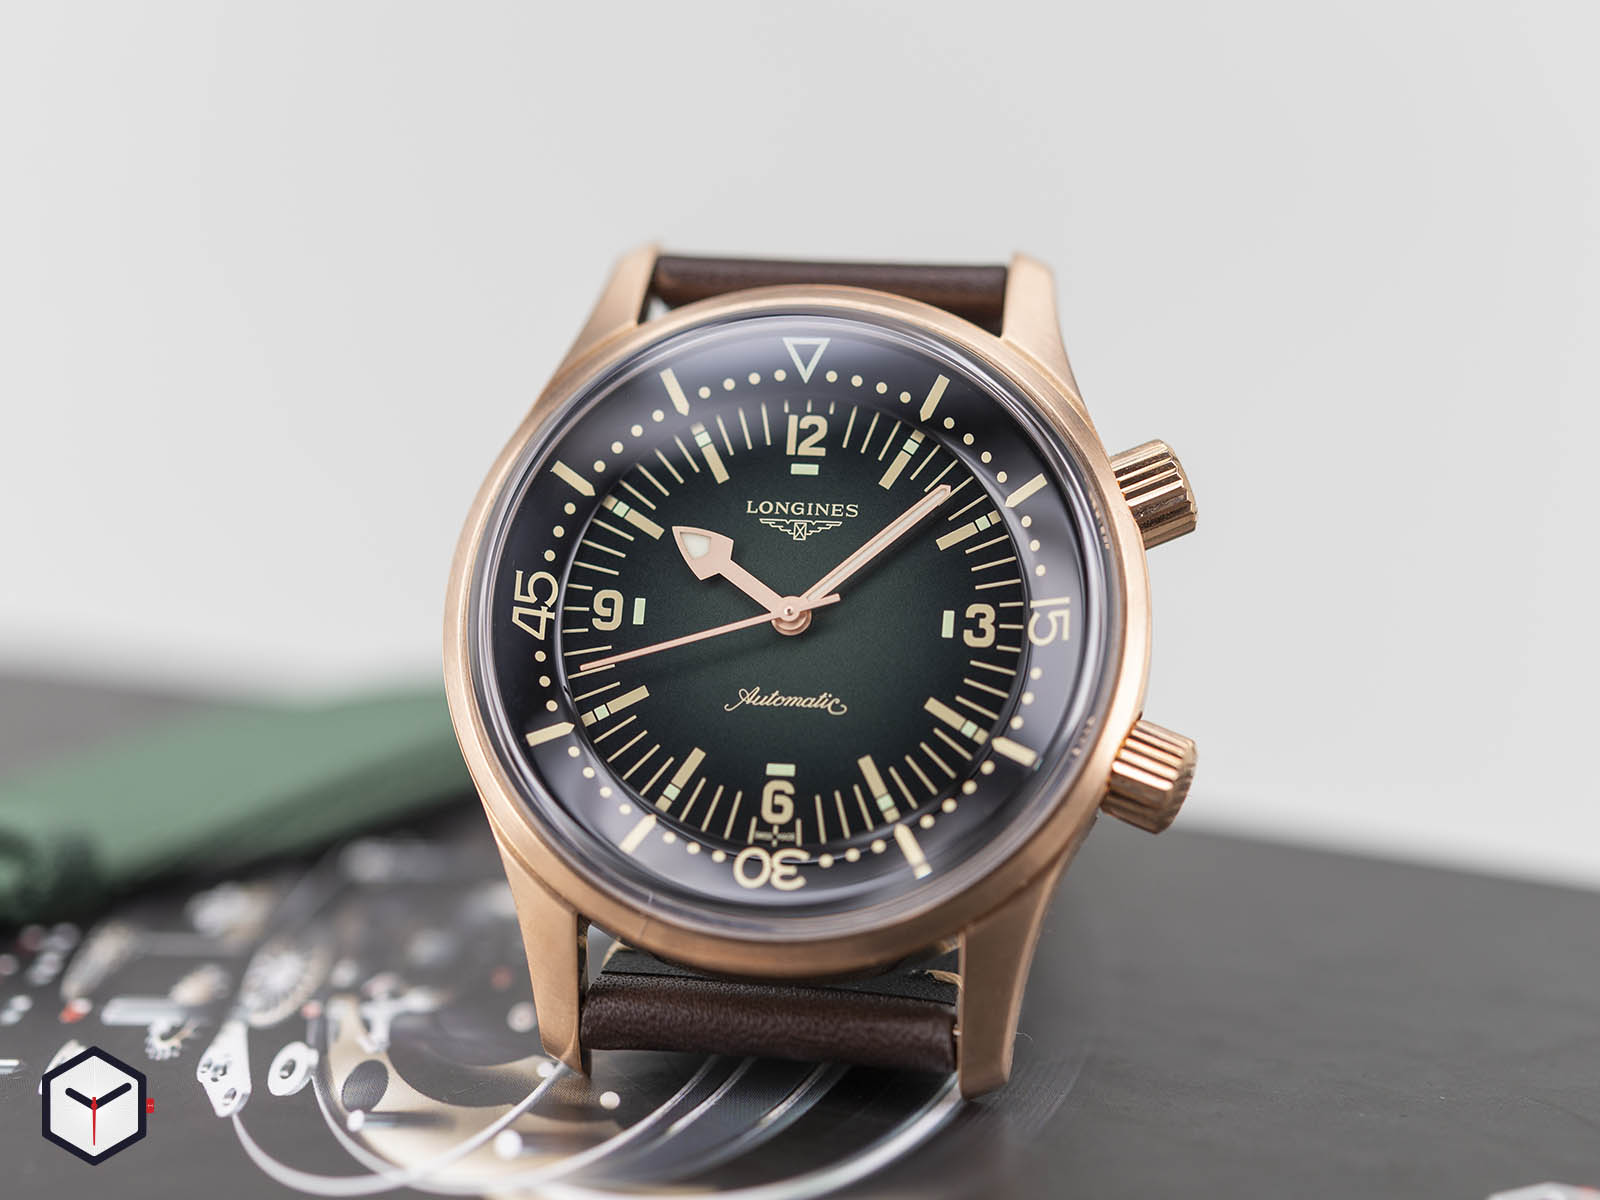 l3-774-1-50-2-longines-legend-diver-bronze-2.jpg